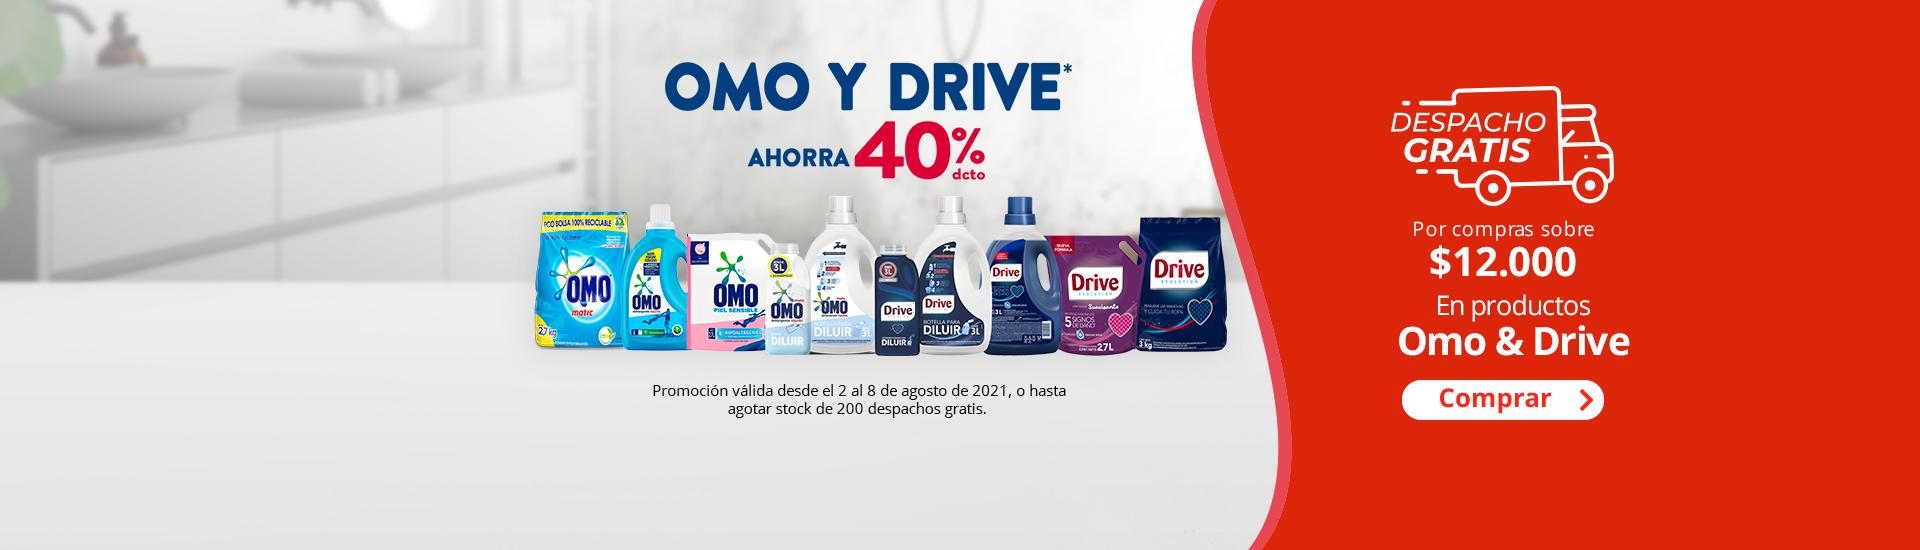 DG Omo - Drive - 4